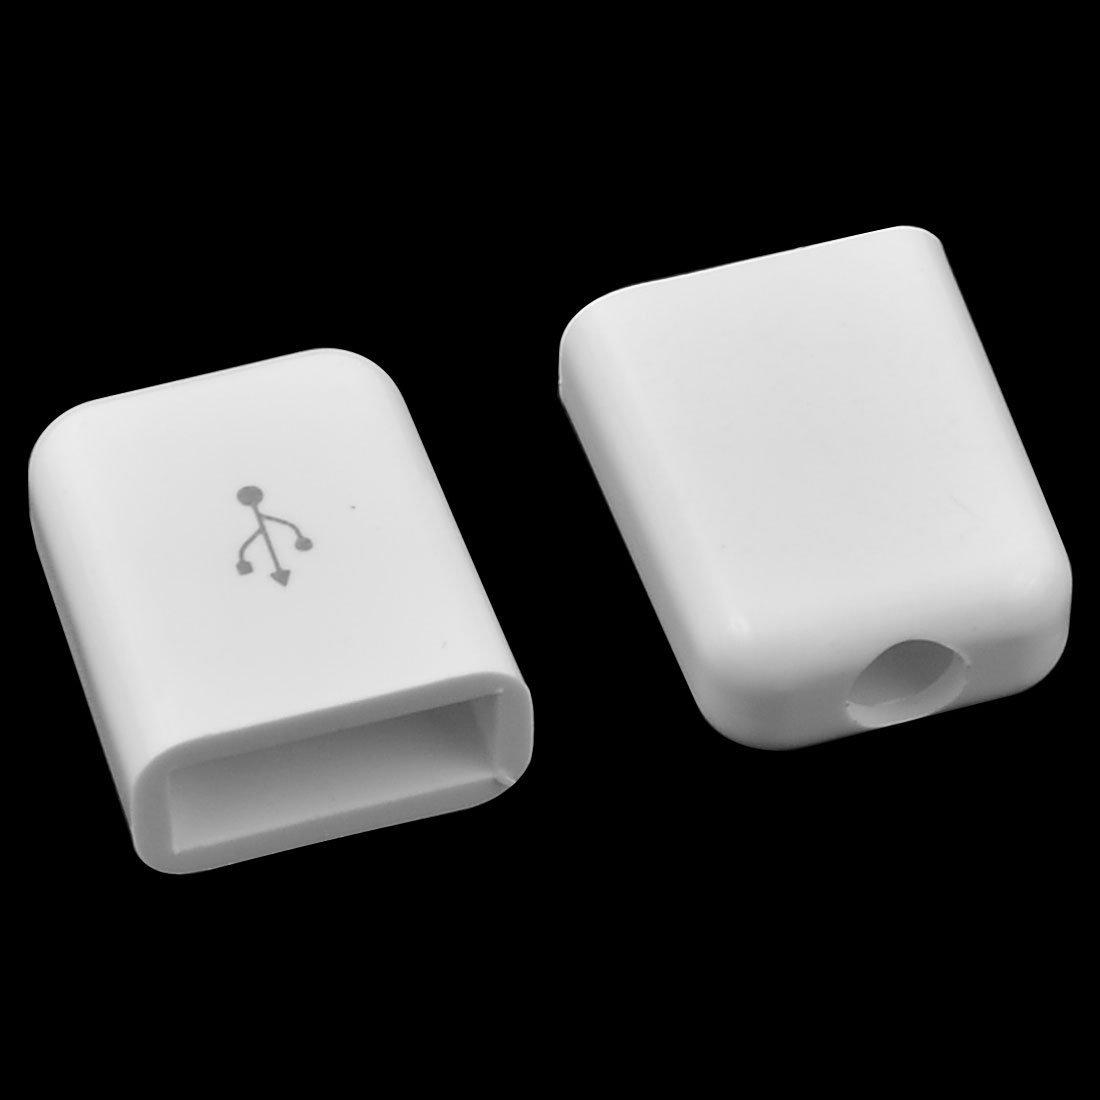 Amazon.com: eDealMax 56pcs 18x15x7mm Conector de soldadura Puerto Shell partes Blancas plástico Redondo Edge USB: Electronics